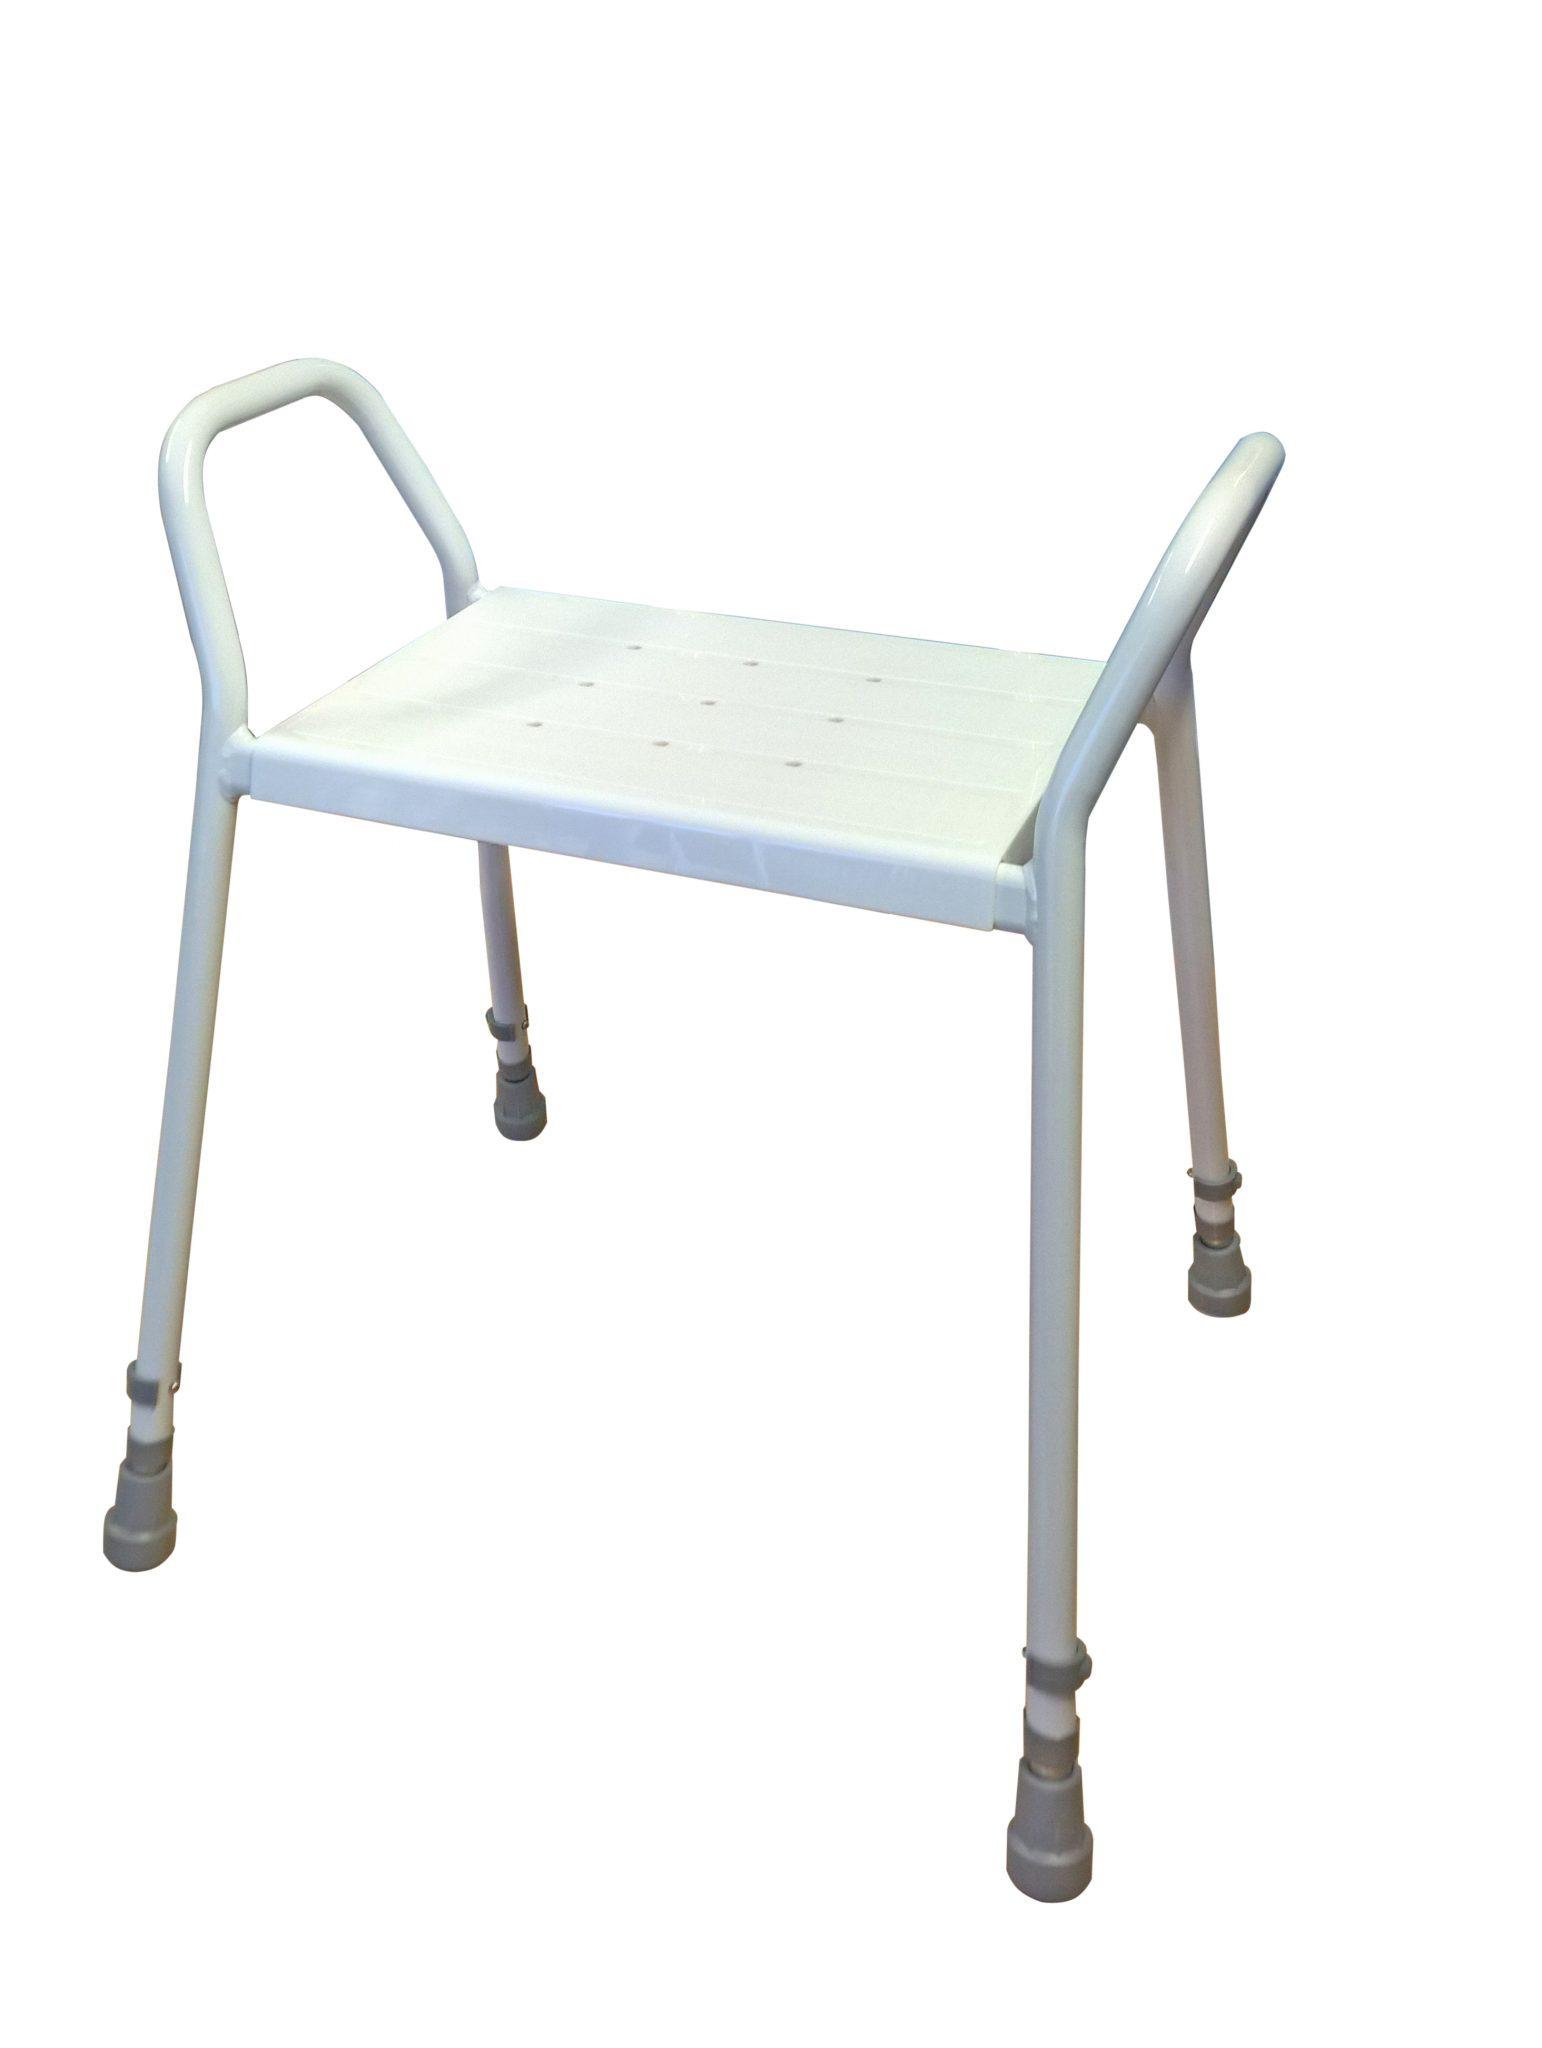 s10 adjustable shower stool - Shower Stool